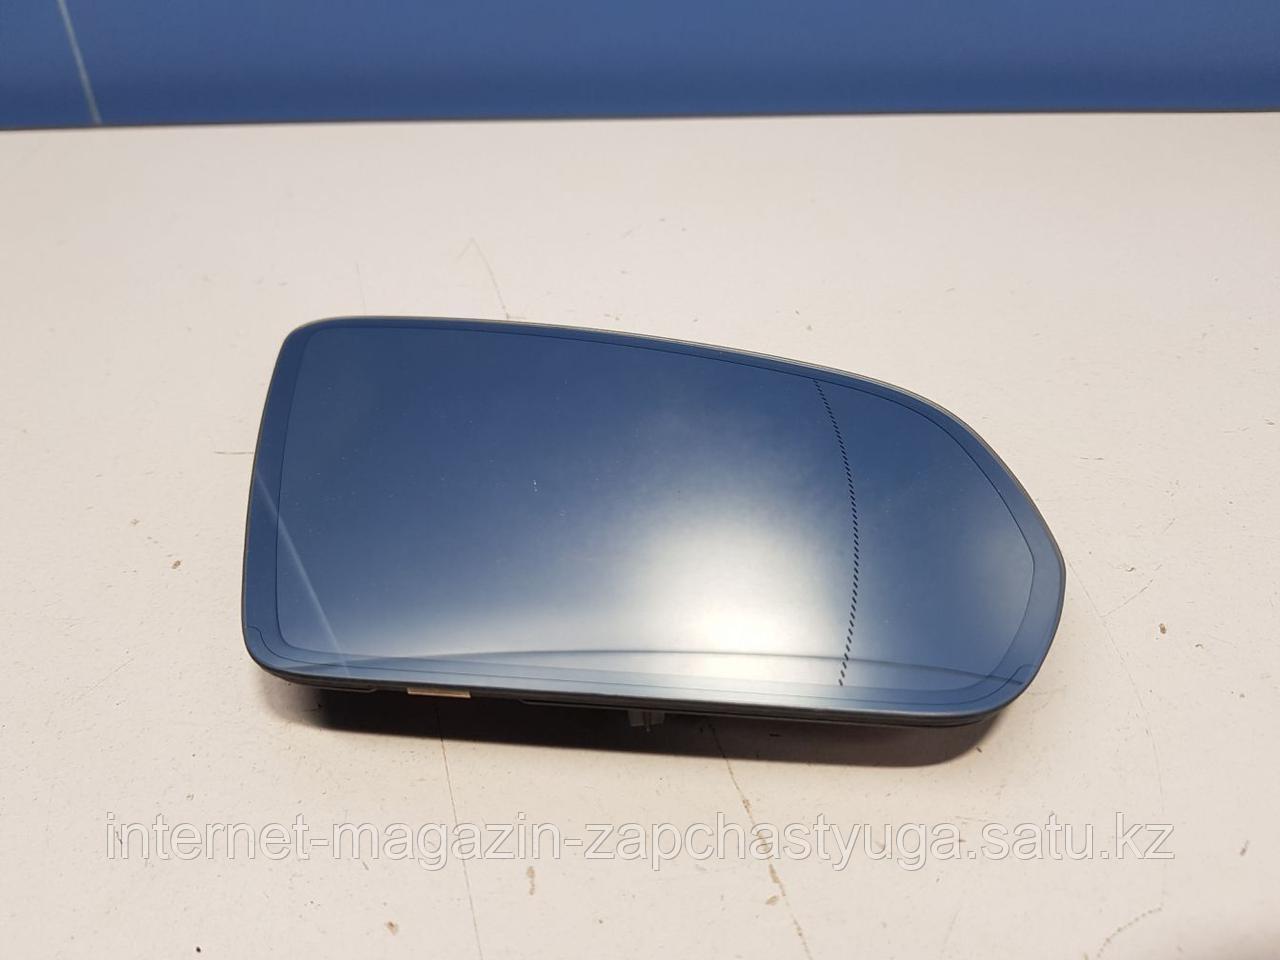 A0998100816 Зеркальный элемент правый для Mercedes S-klasse W222 2013-2020 Б/У - фото 1